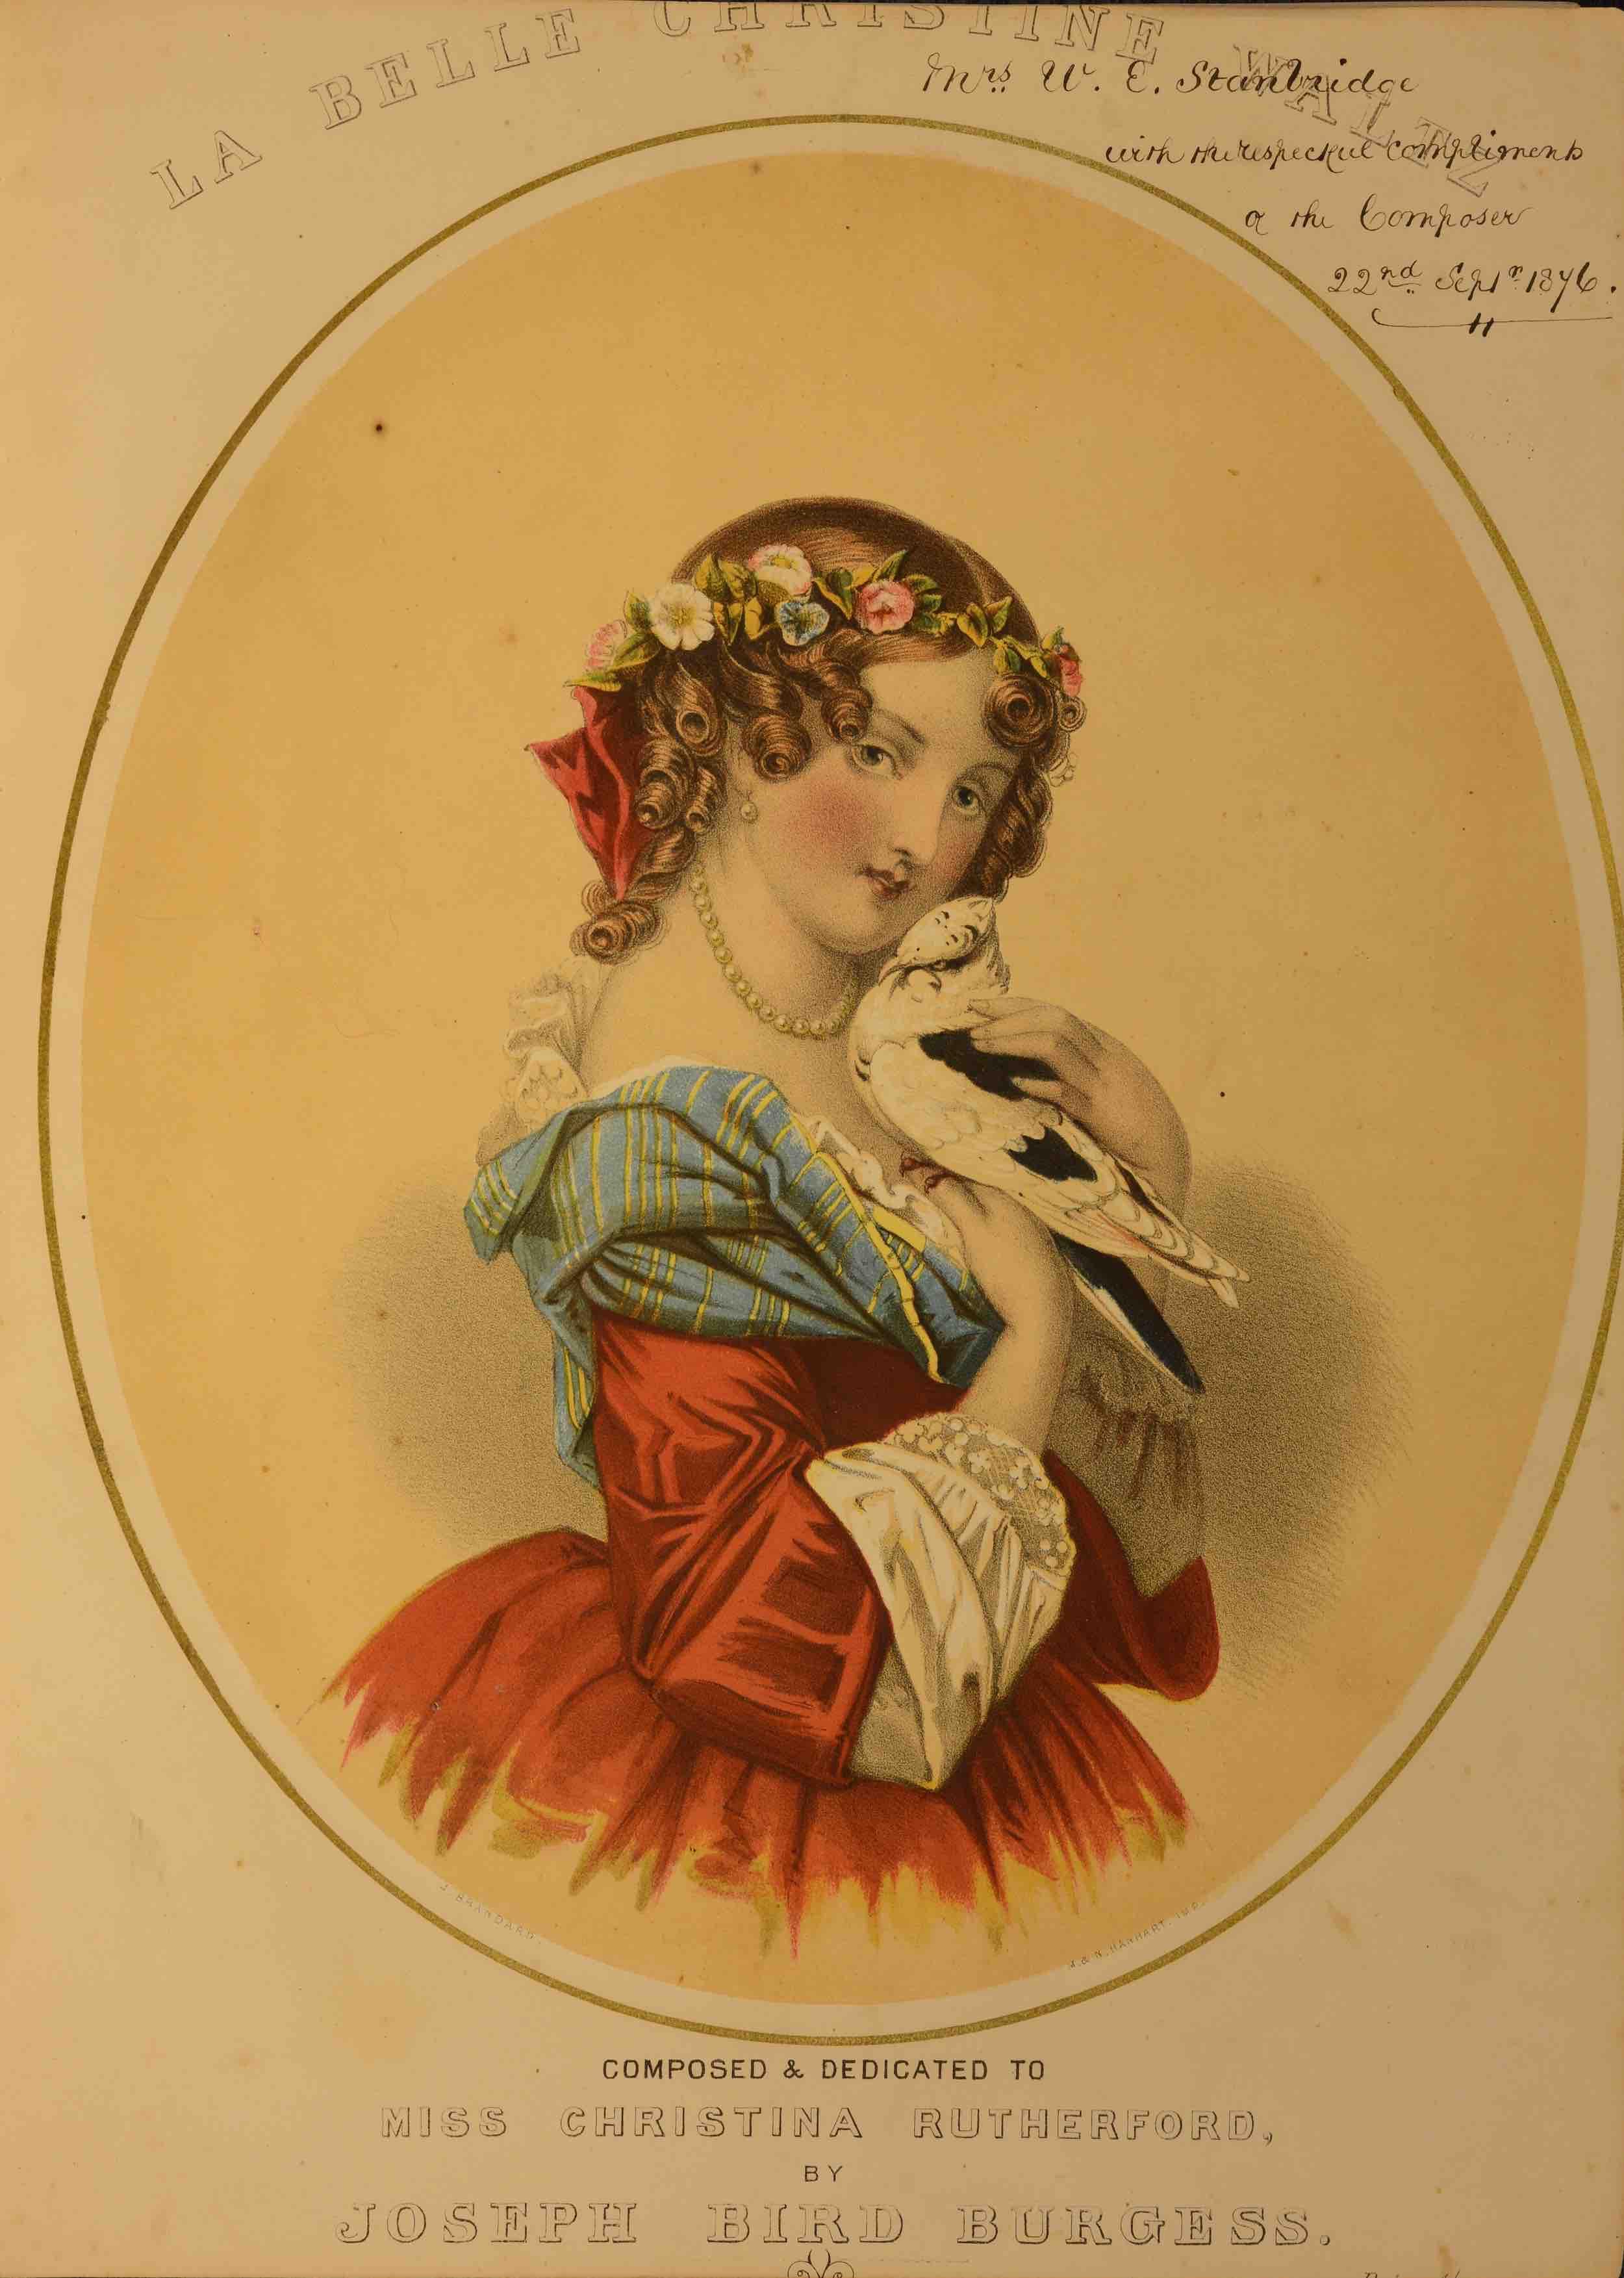 UniM Bail Music RB f  A COLL1.1 <br> Joseph Bird Burgess, composer ; John Brandard, illustrator <br> La belle Christine  <br> London , [between 1872 & 76] <br> Australian-composed sheet music